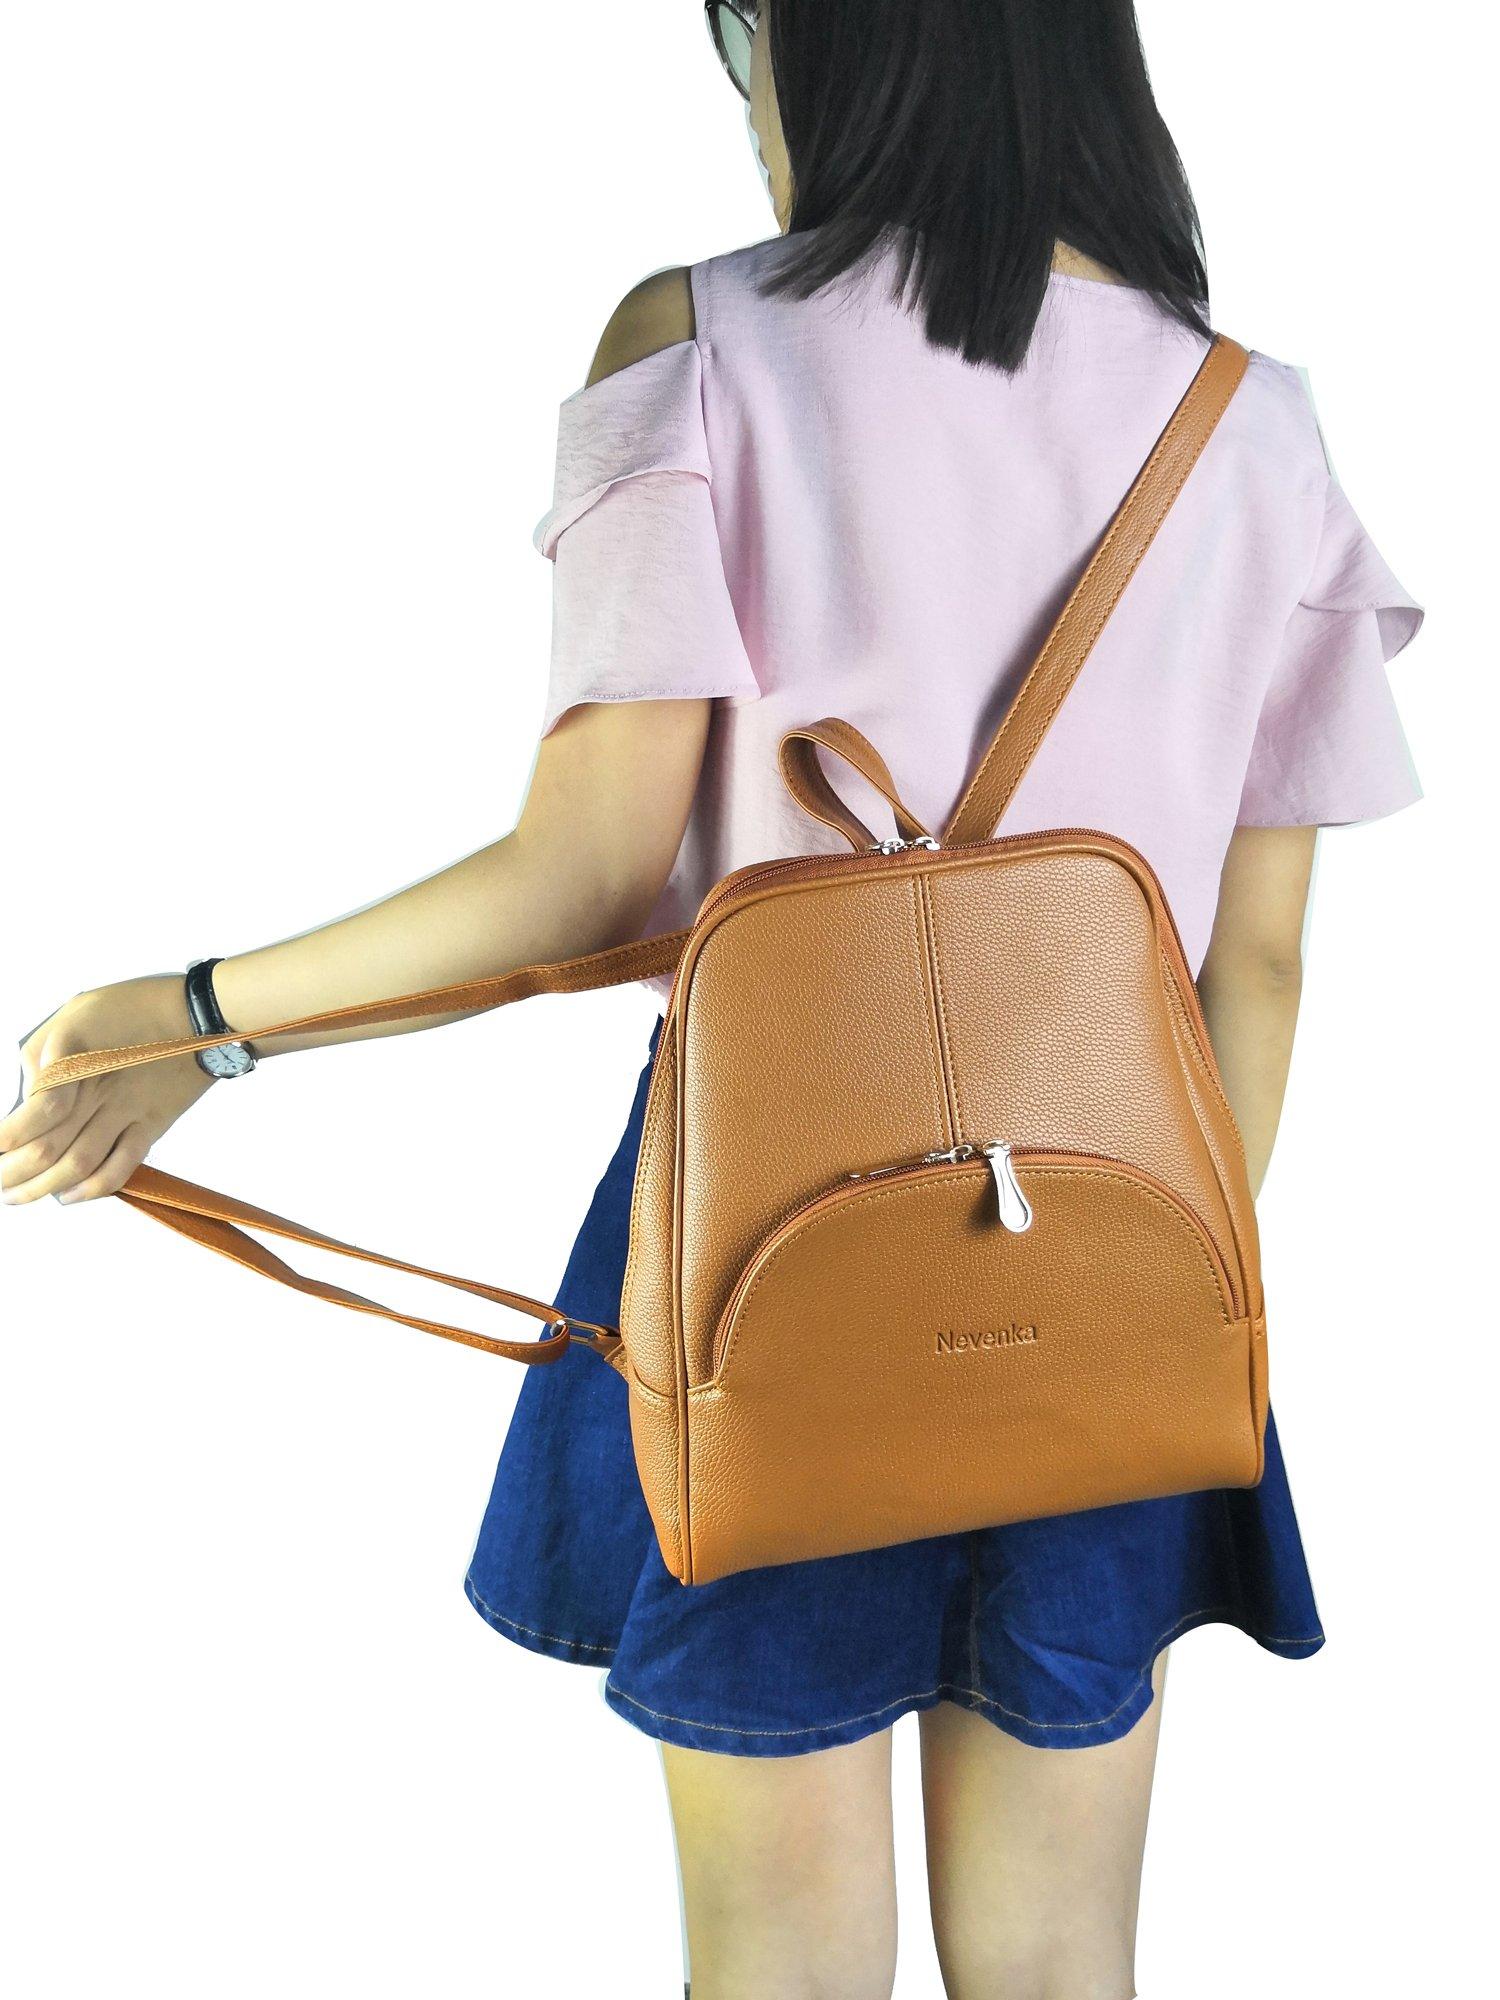 Nevenka Brand Women Bags Backpack Purse PU Leather Zipper Bags Casual Backpacks Shoulder Bags (Autumn Maple) by Nevenka (Image #5)